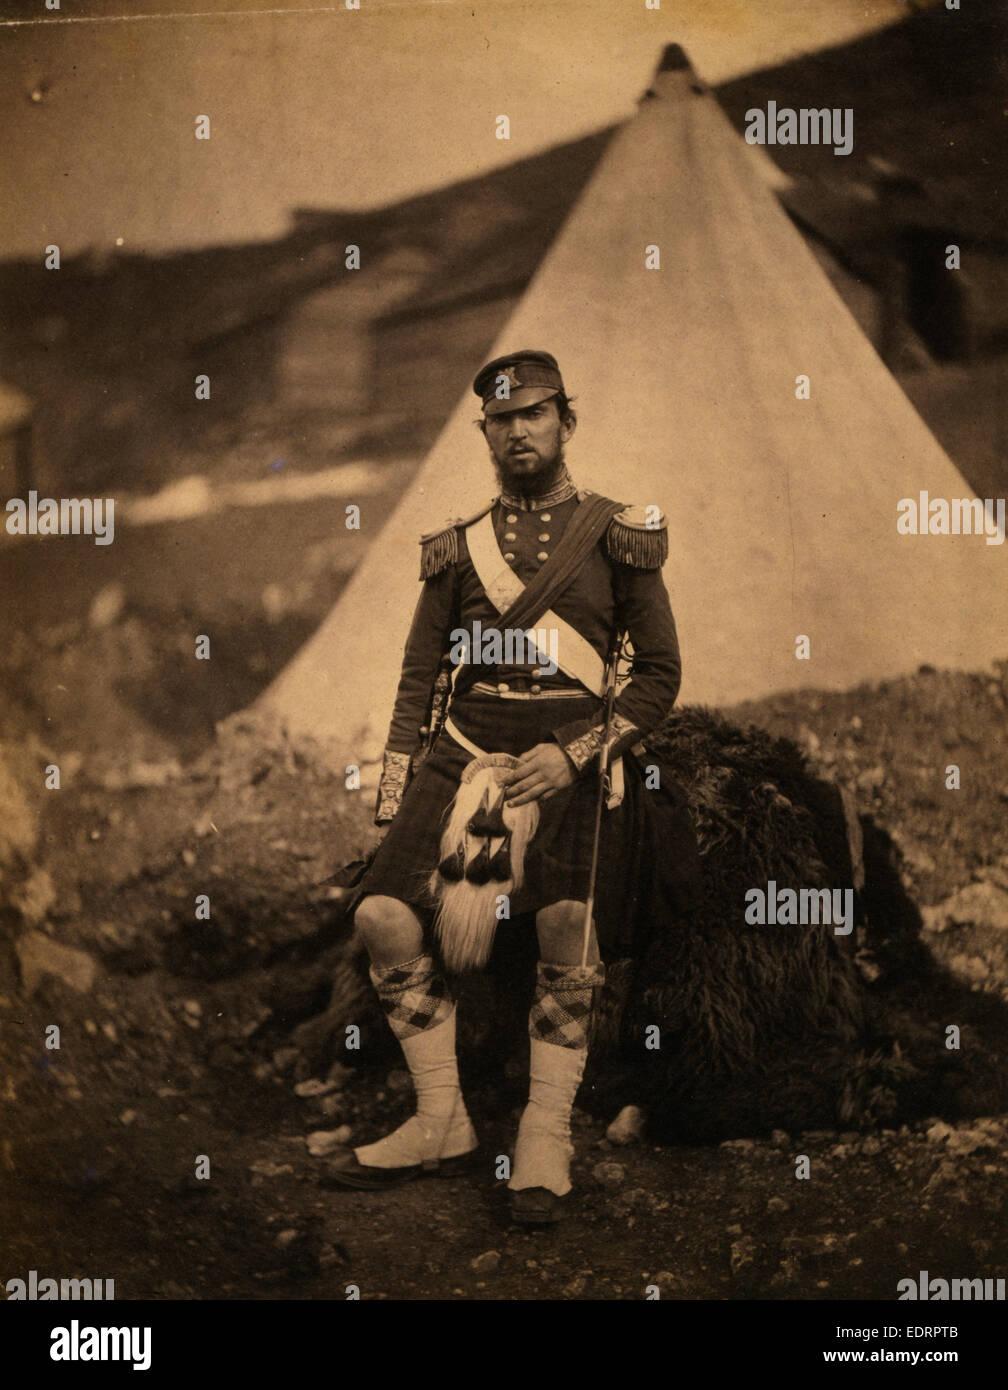 Captain Cuninghame, 42nd Regiment, Crimean War, 1853-1856, Roger Fenton historic war campaign photo - Stock Image